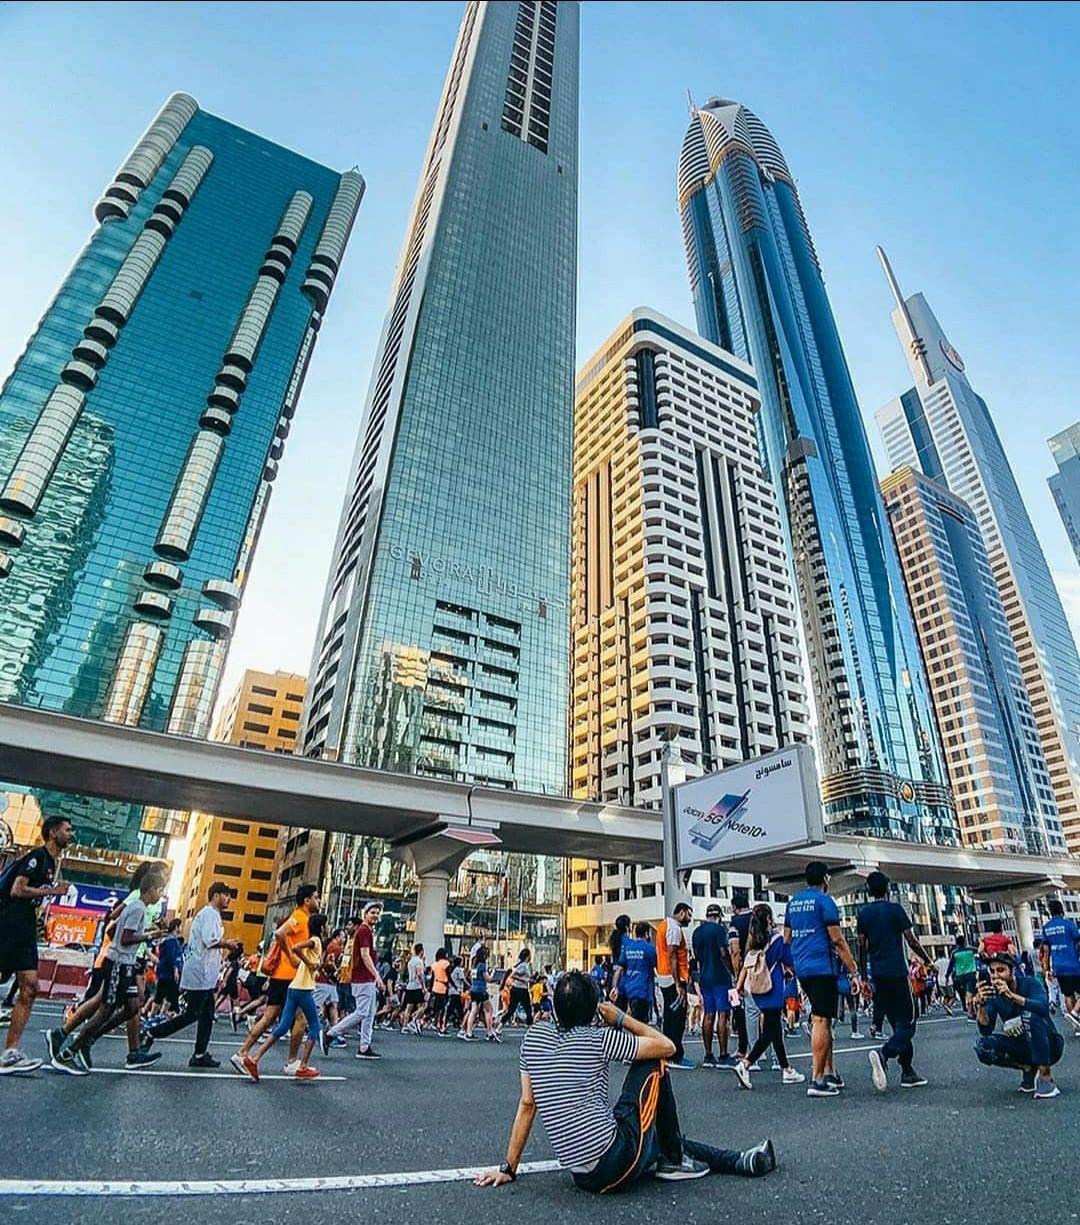 Photo of Sheikh Zayed Road - Dubai - United Arab Emirates By Sandeep Soni